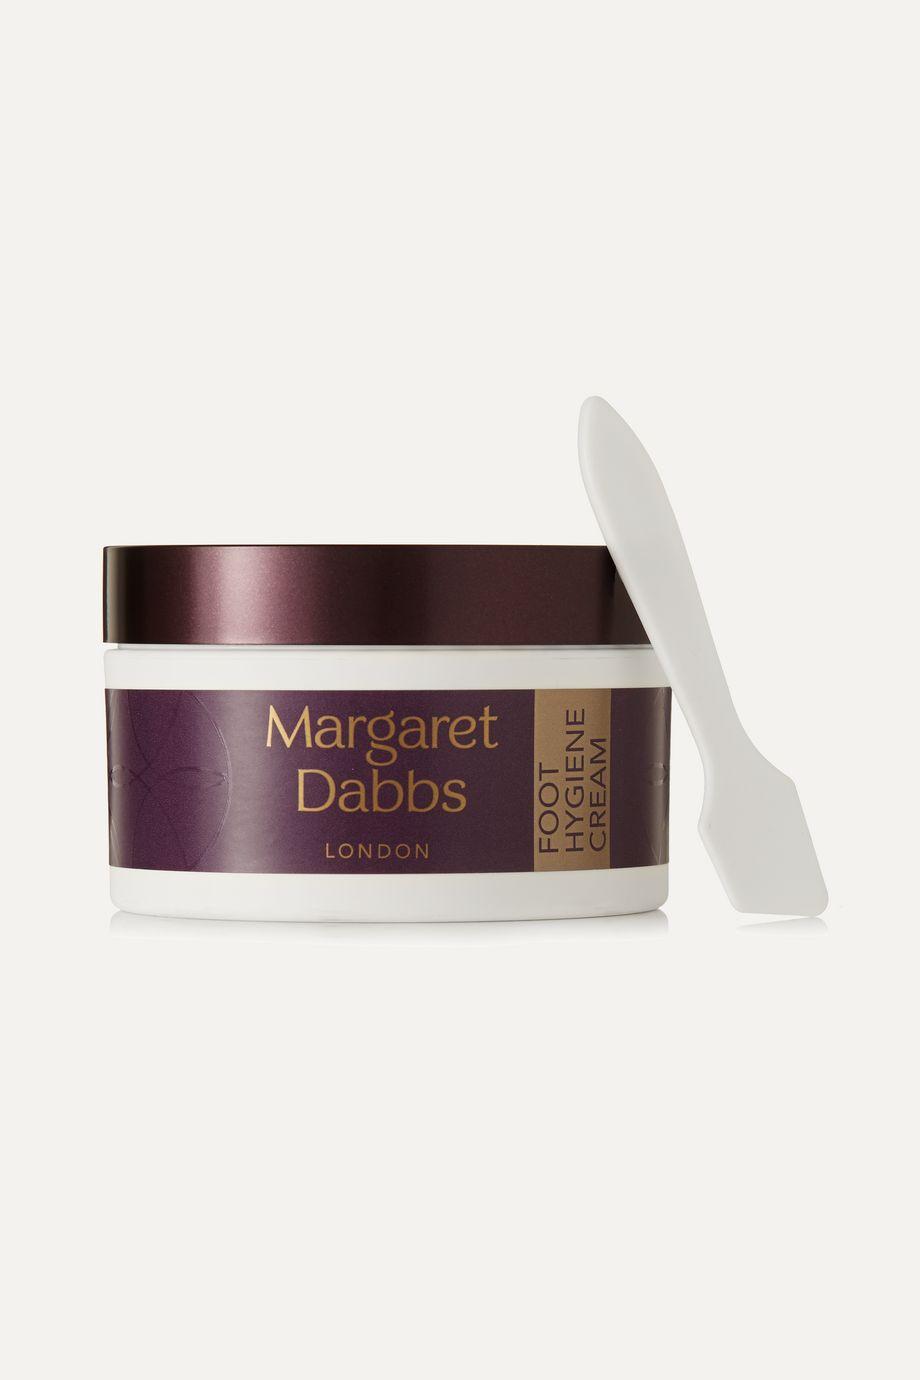 Margaret Dabbs London Foot Hygiene Cream, 100ml